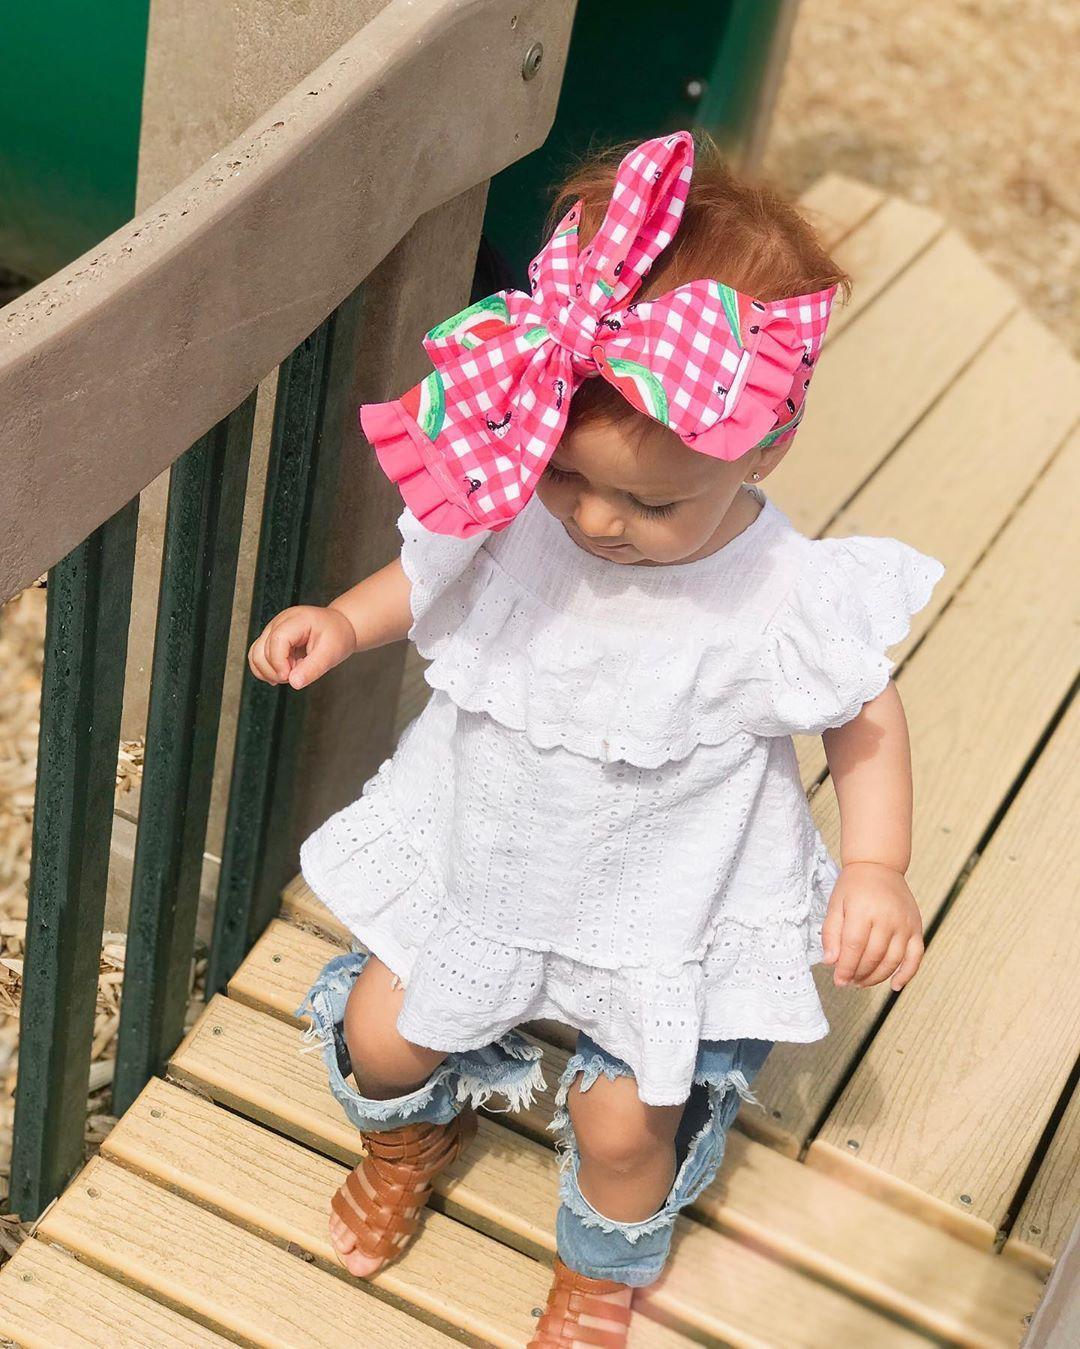 Life is sweet! 🍉🍉🍉 . . . . . . . . . . . . . . . . . . . . #babyadventures #cutebabies #babyphotography #babyfashionblogger #babyfashion #toddlerfashion #babyfashionista #babiesofinstagram #cutetoddlerstyles #mamarazzi #kidzootd #kidzfashion #momswithcameras #kidzootd #toddlerootd #bigbows #shorthairdontcare #redhead #toddlerfashion #toddlerlife #toddlerfun #toddleradventures #ig_fashionkiddies #fashionminis #glambaby #shopsmall #babyadventures,#cutebabies,#babyphotography,#babyfashionblogger